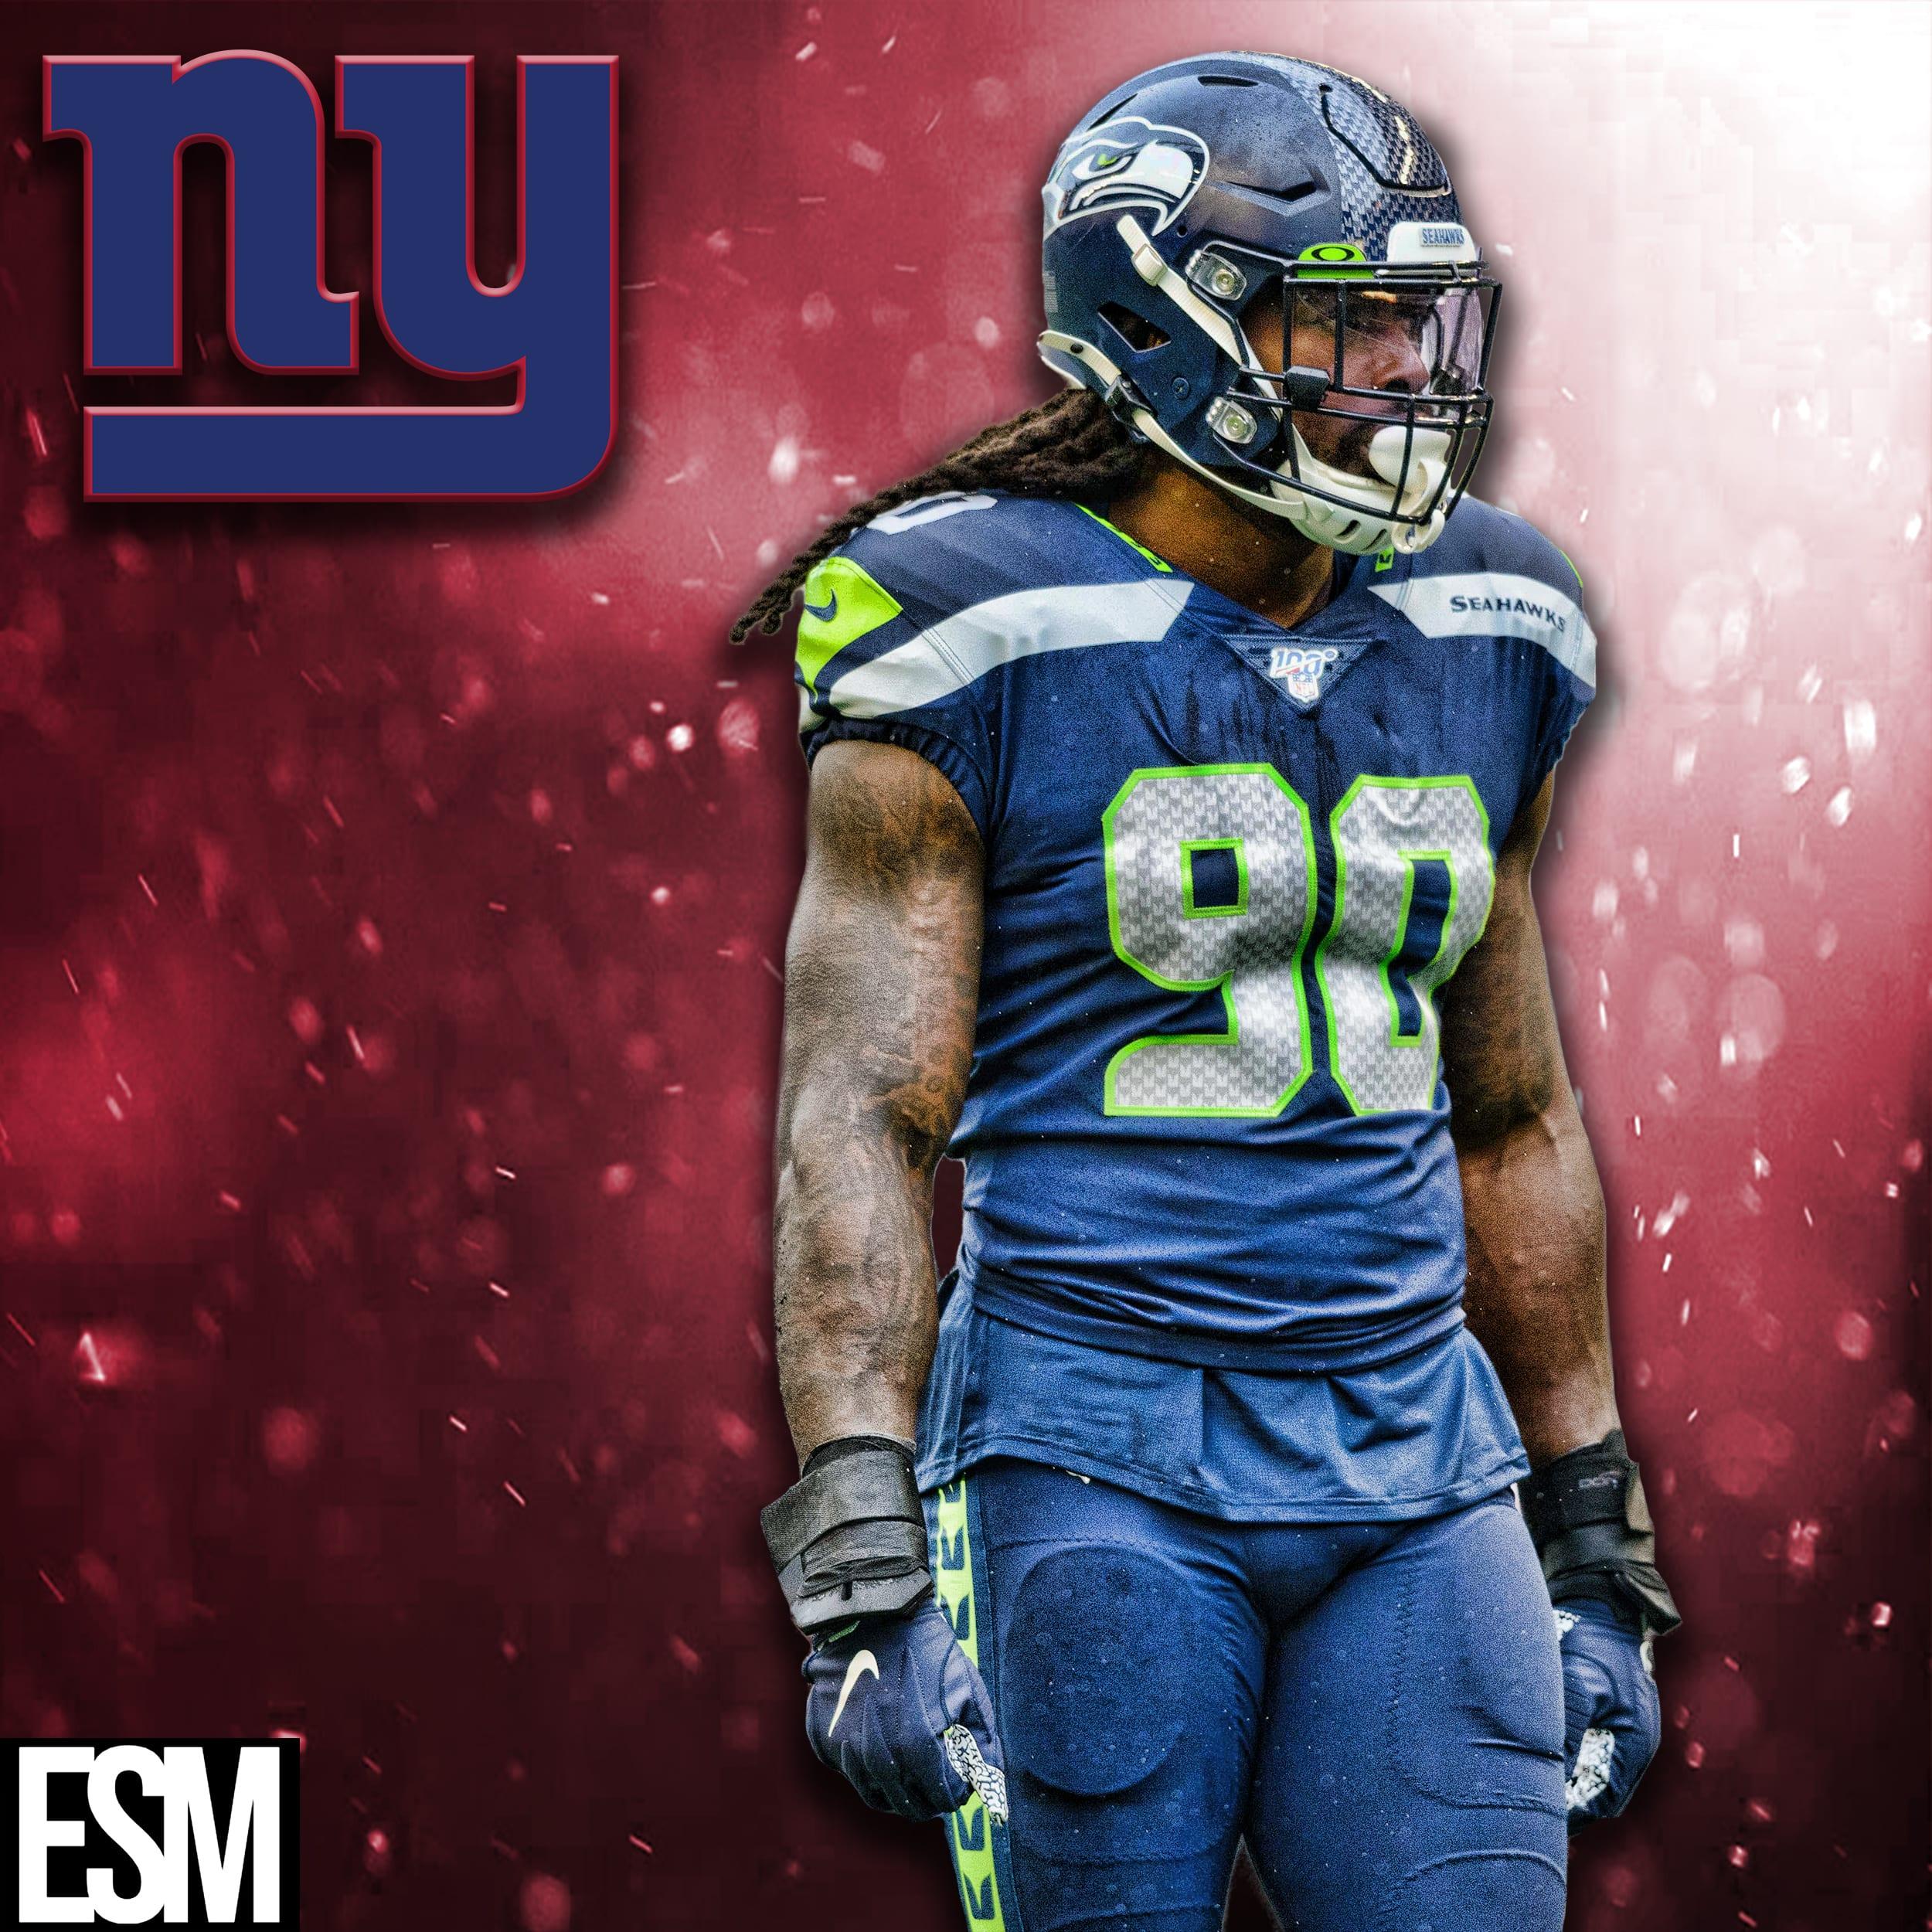 New York Giants, Jadeveon Clowney